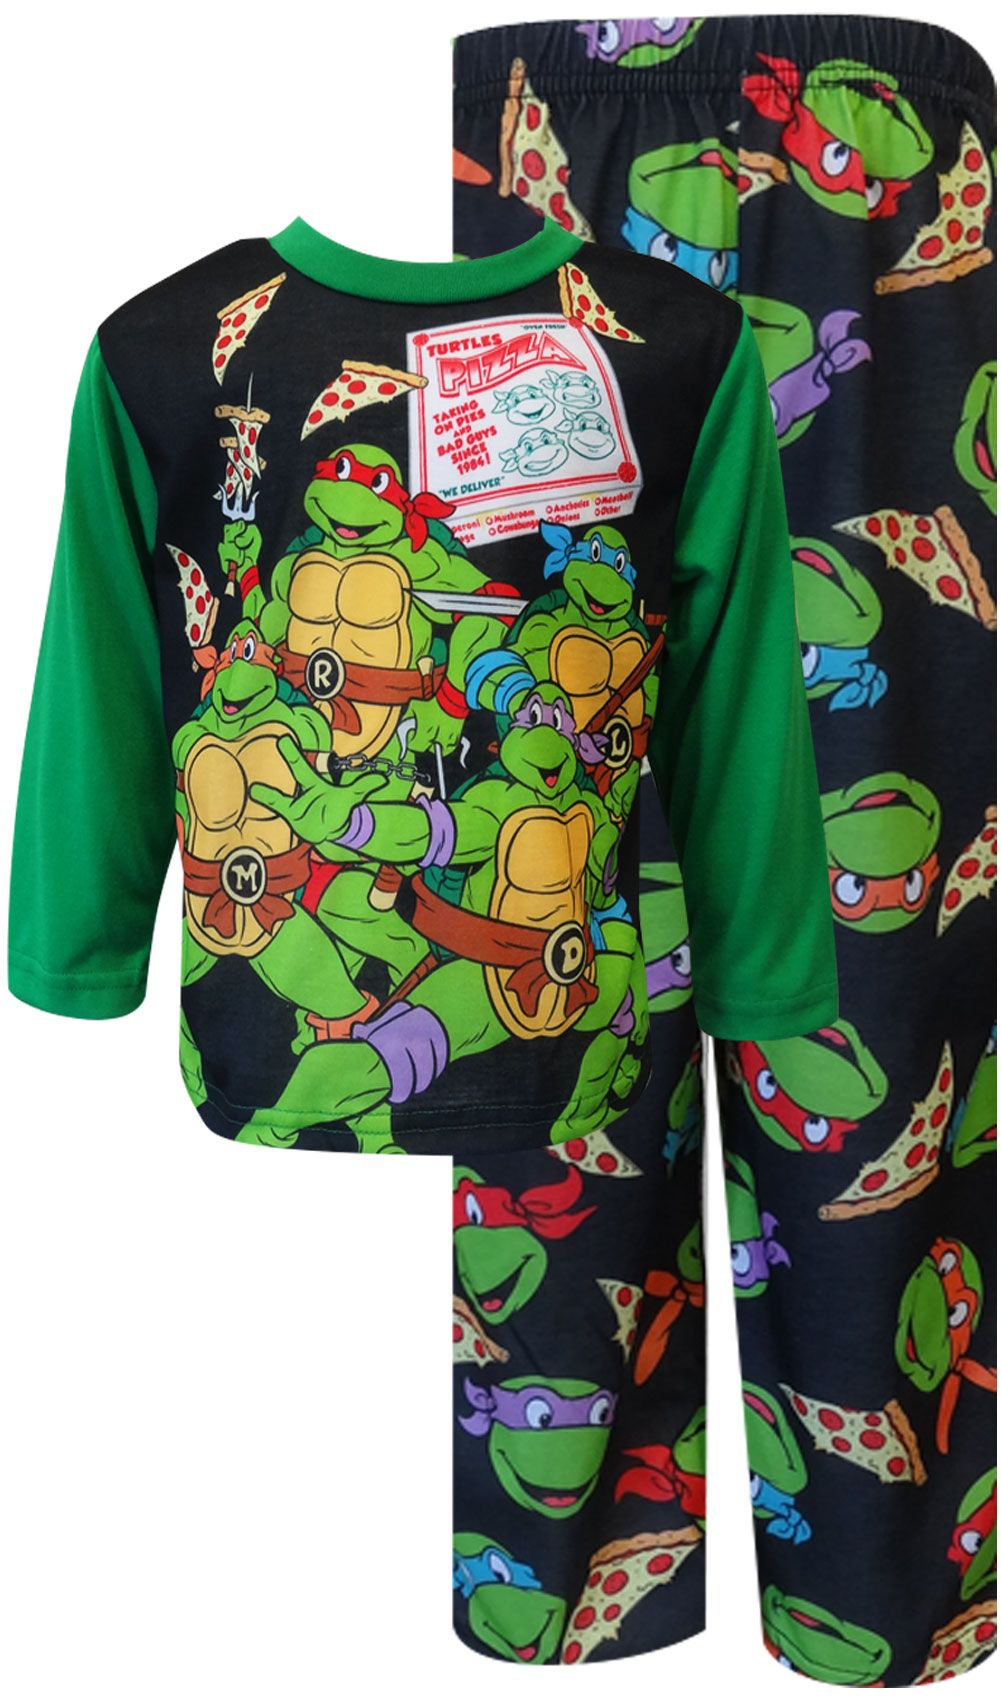 Teenage Mutant Ninja Turtle Pizza Party Toddler Pajama Set